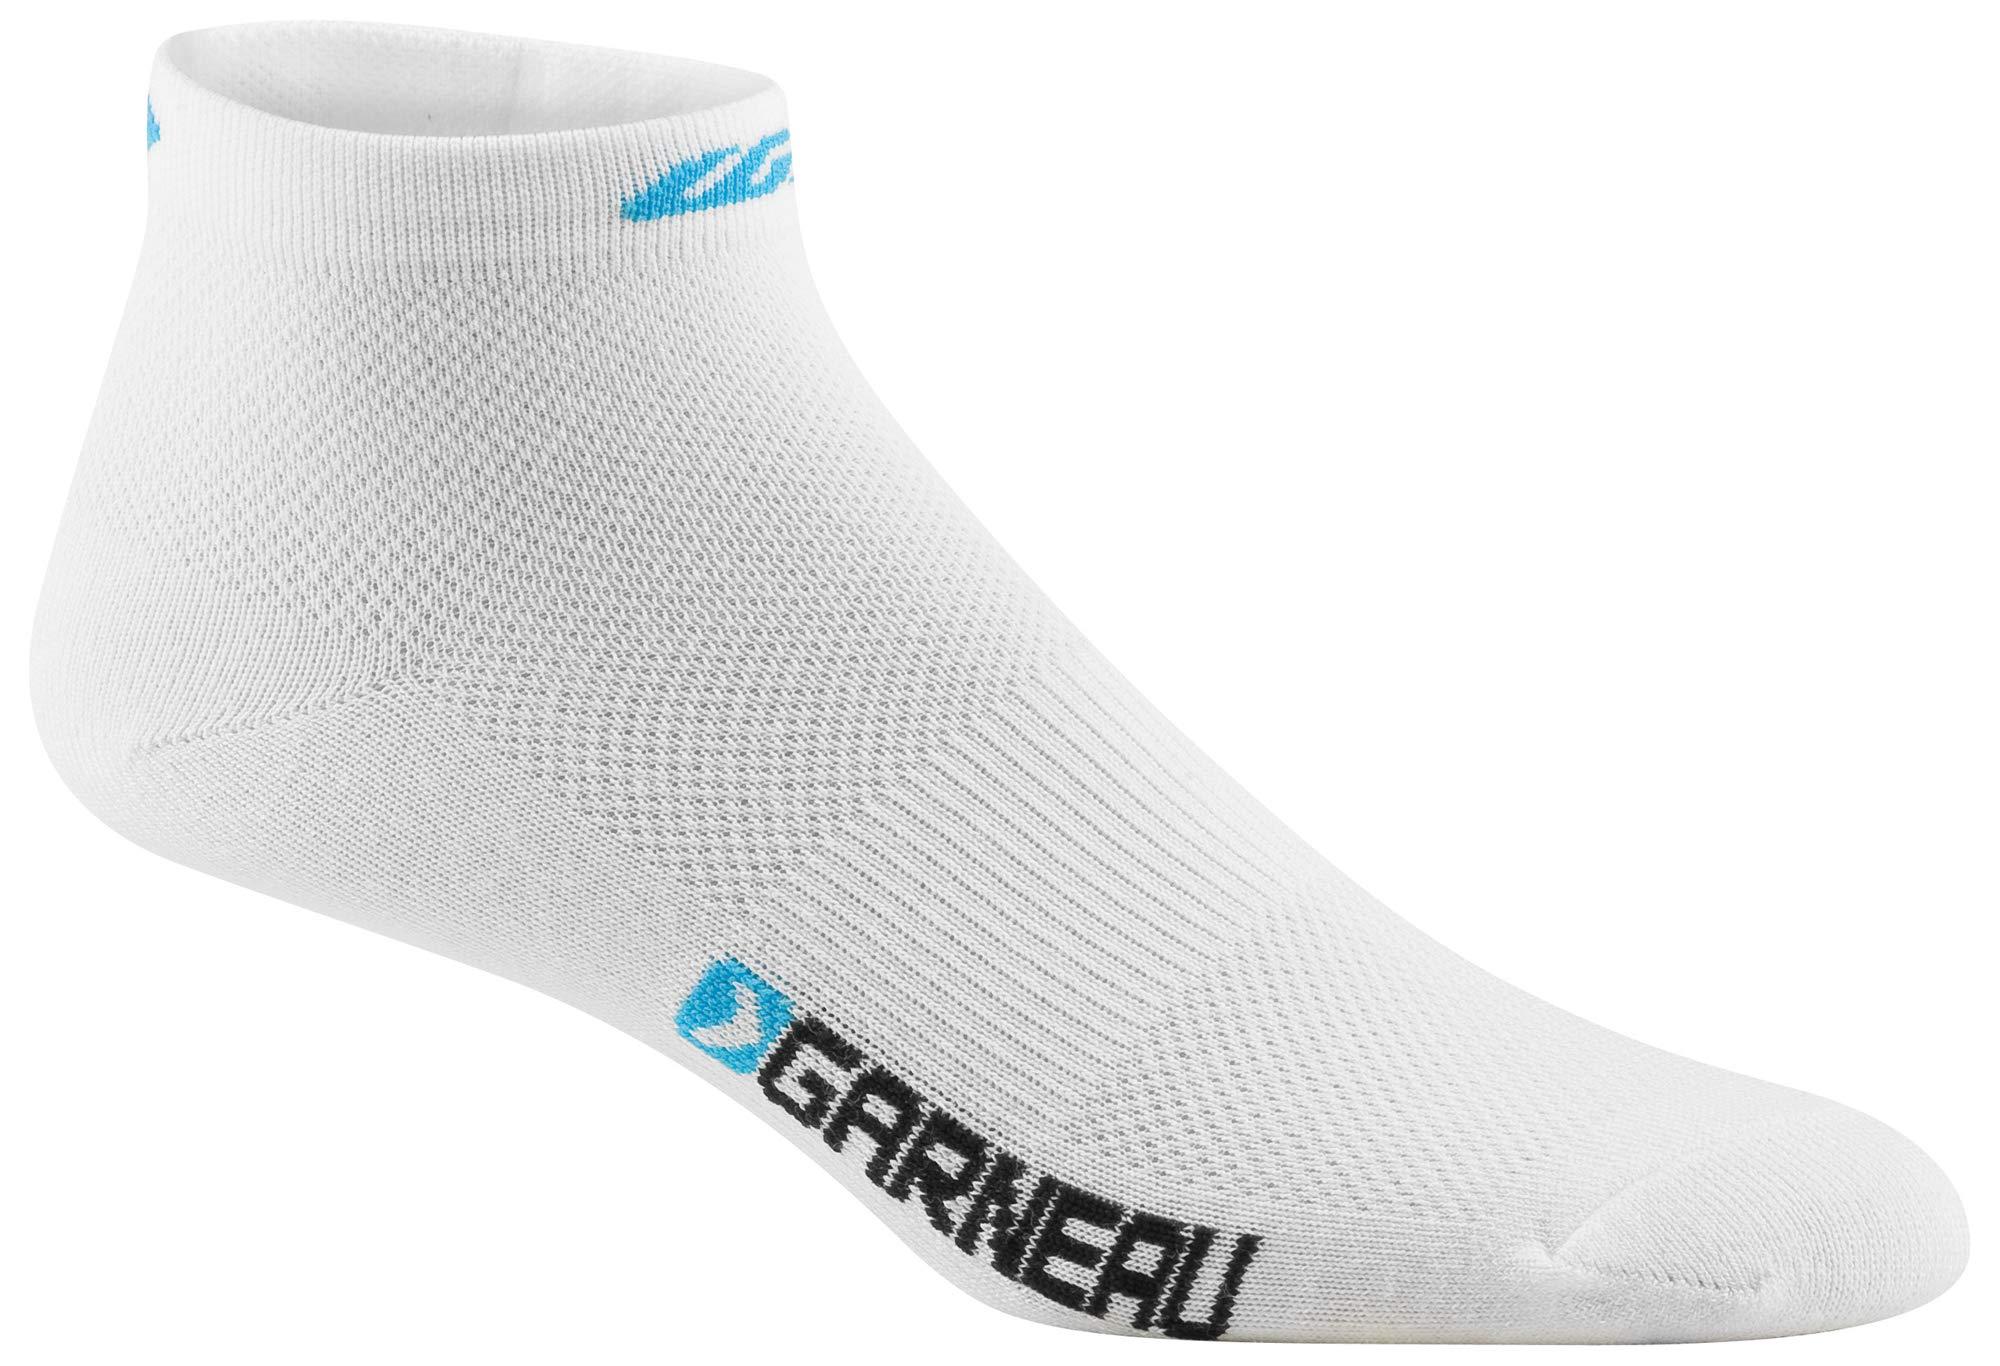 Louis Garneau Women's Low Versis Lightweight, Moisture Wicking Cycling Socks Cycling Socks 3-Pack, Atomic Blue, Large/X-Large by Louis Garneau